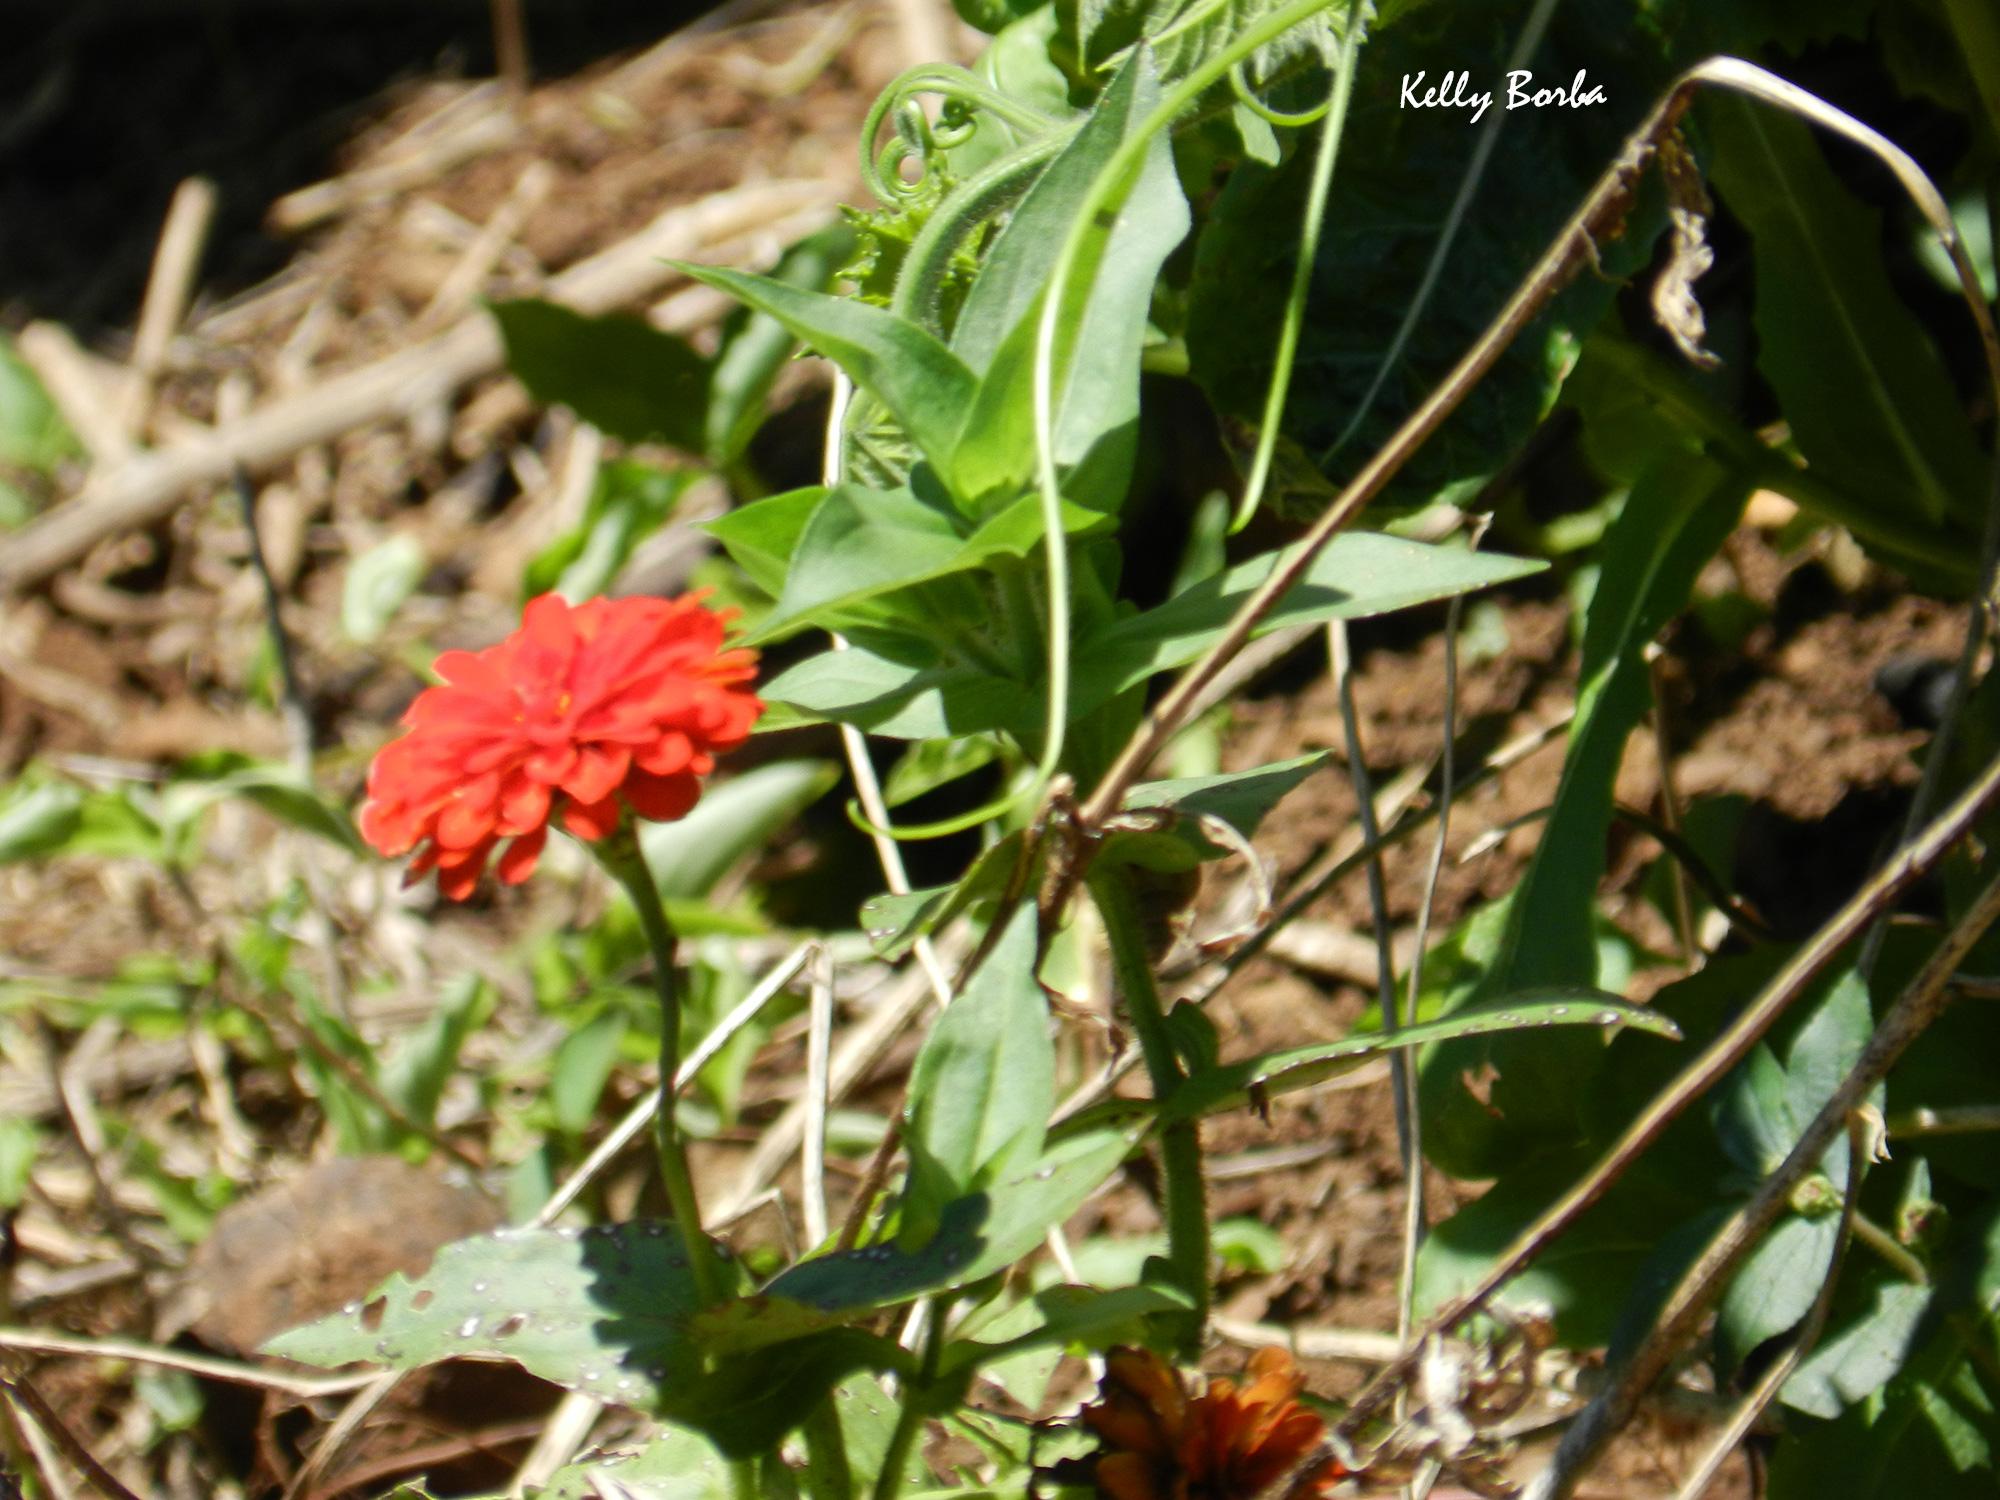 Rosa laranja-ferrugem